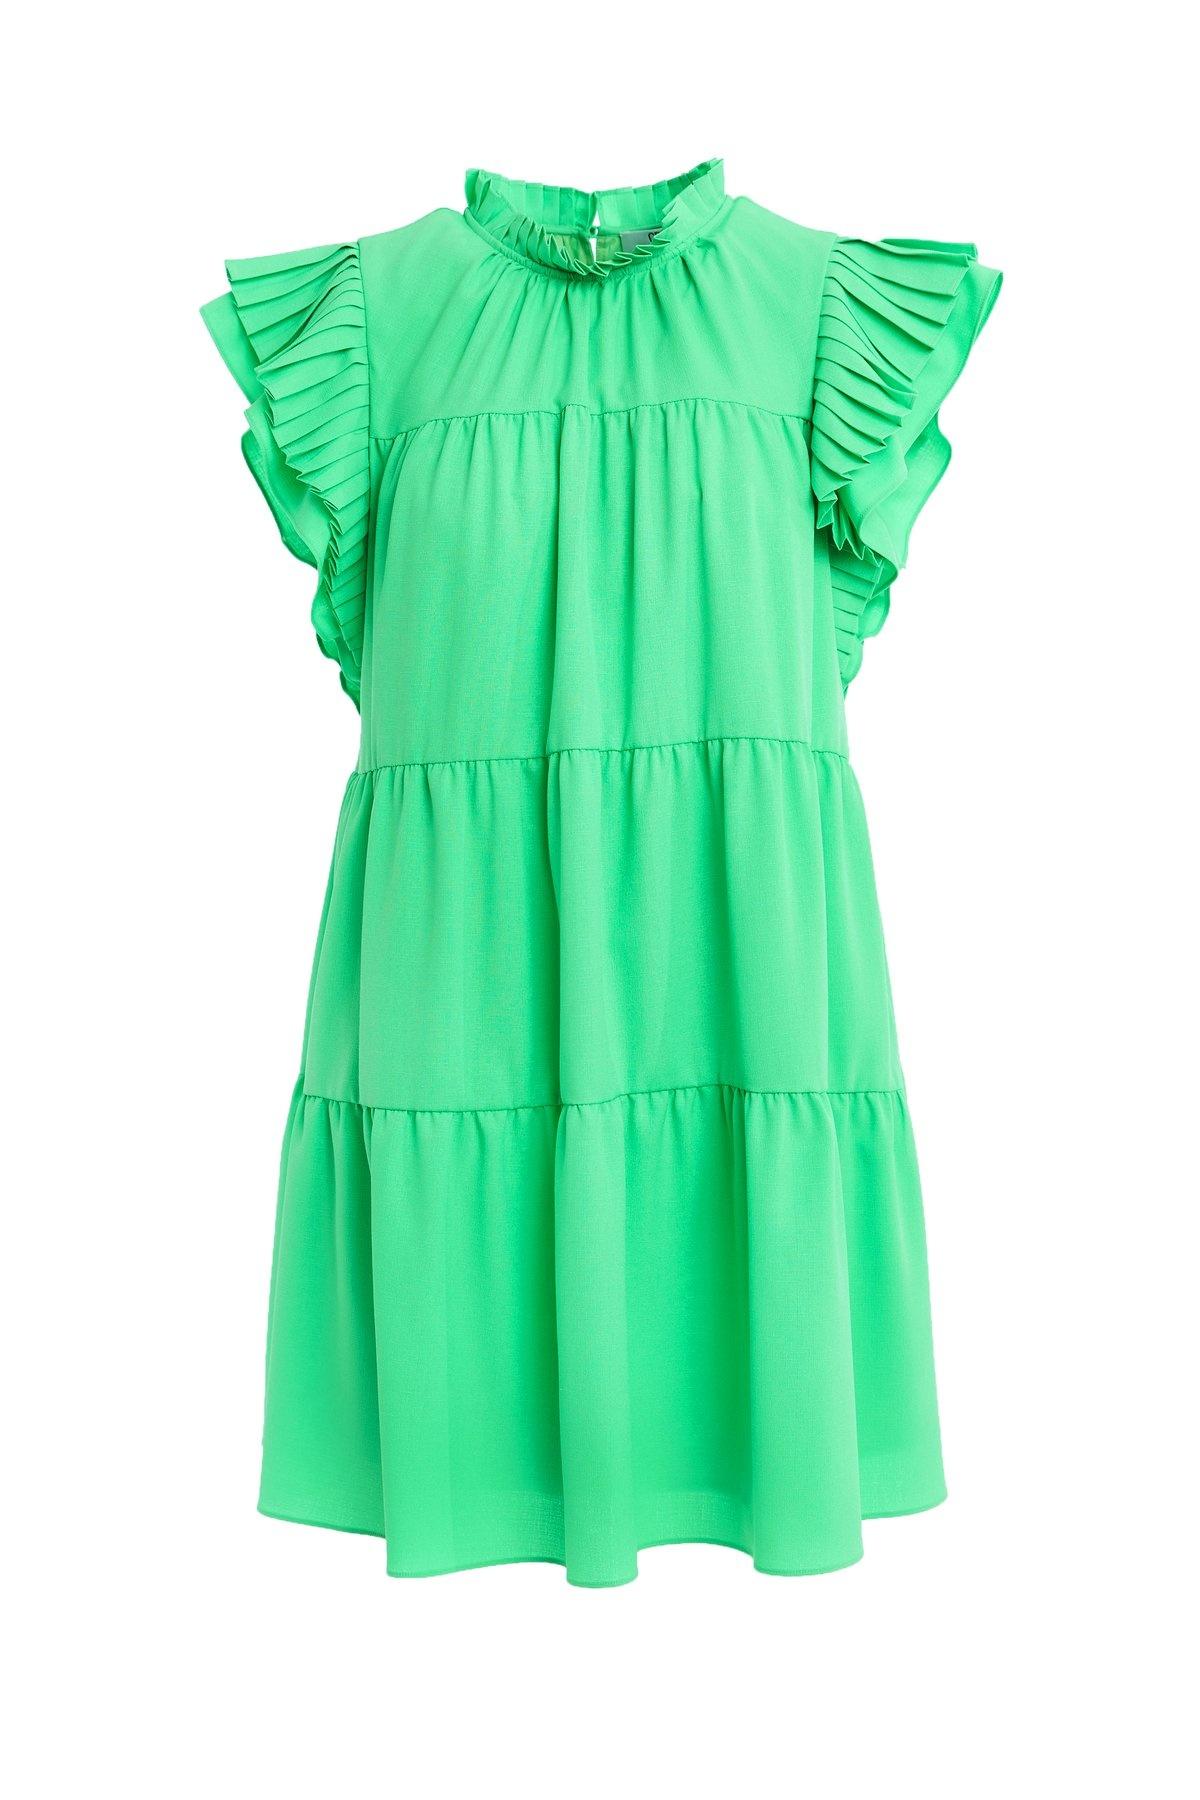 Crosby By Mollie Burch Millie Dress in Parakeet